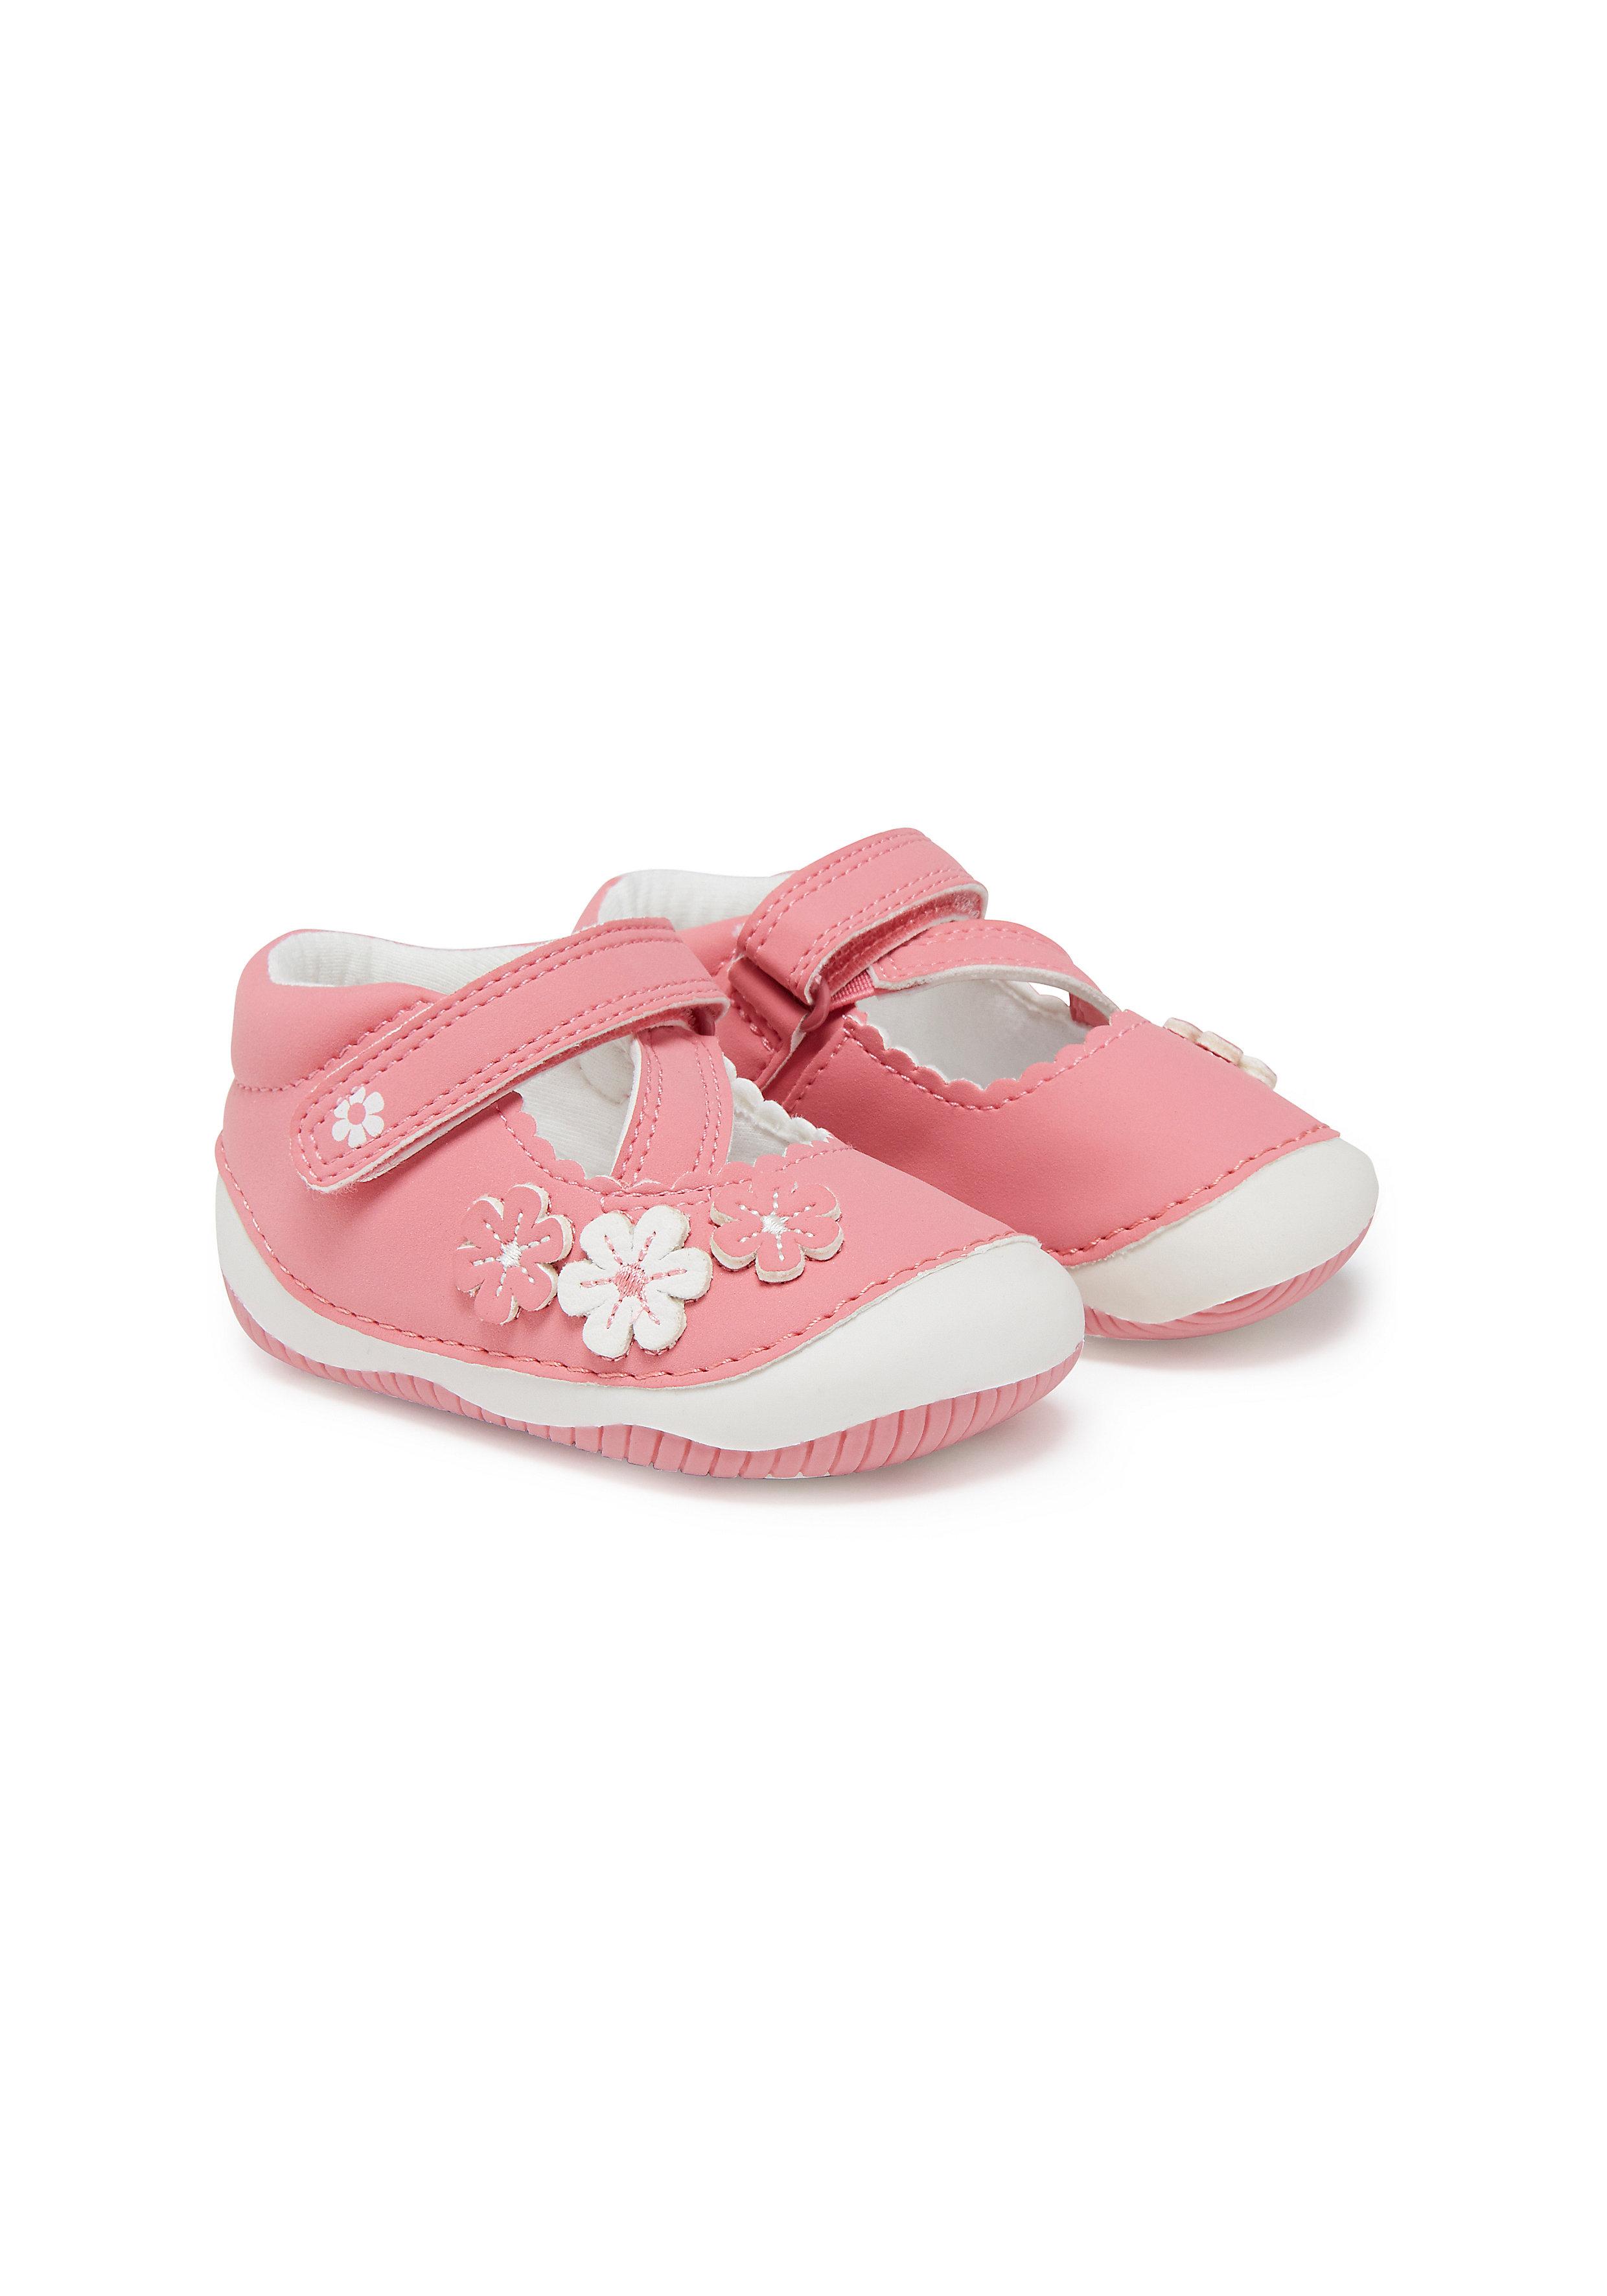 Mothercare | Girls First Walker Shoes Flower Detail - Pink